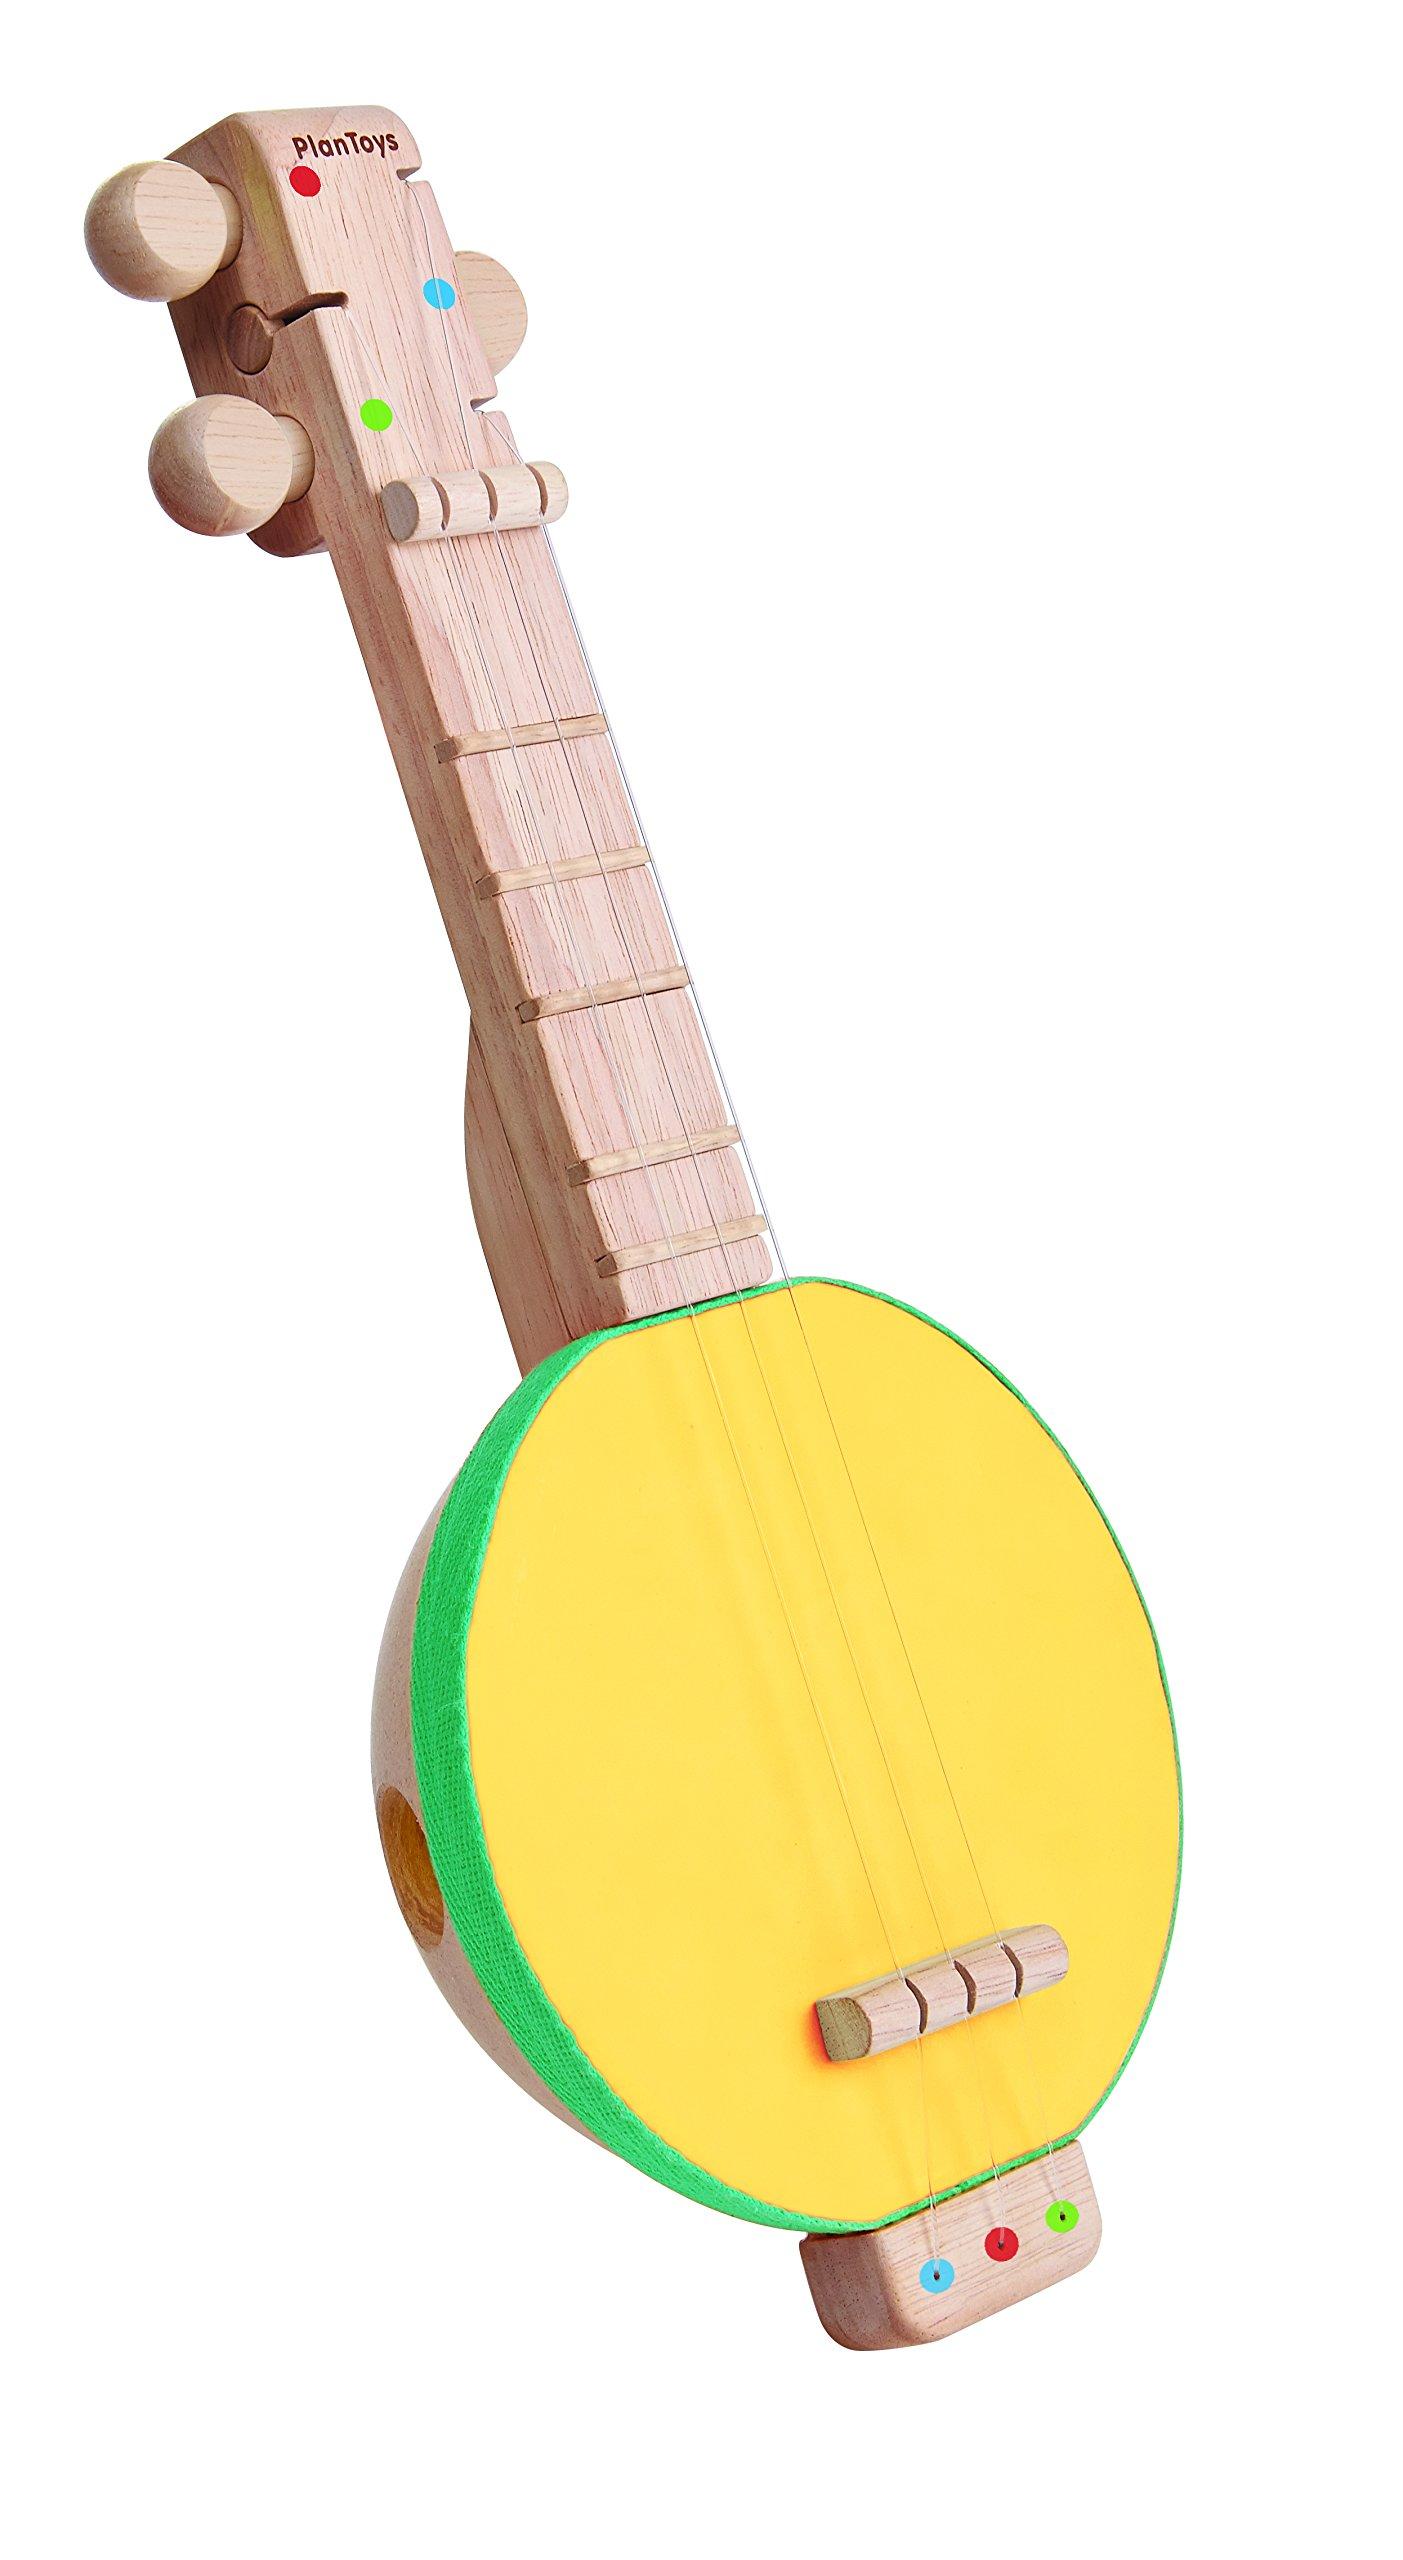 PlanToys 6436 Banjolele Music Set by PlanToys